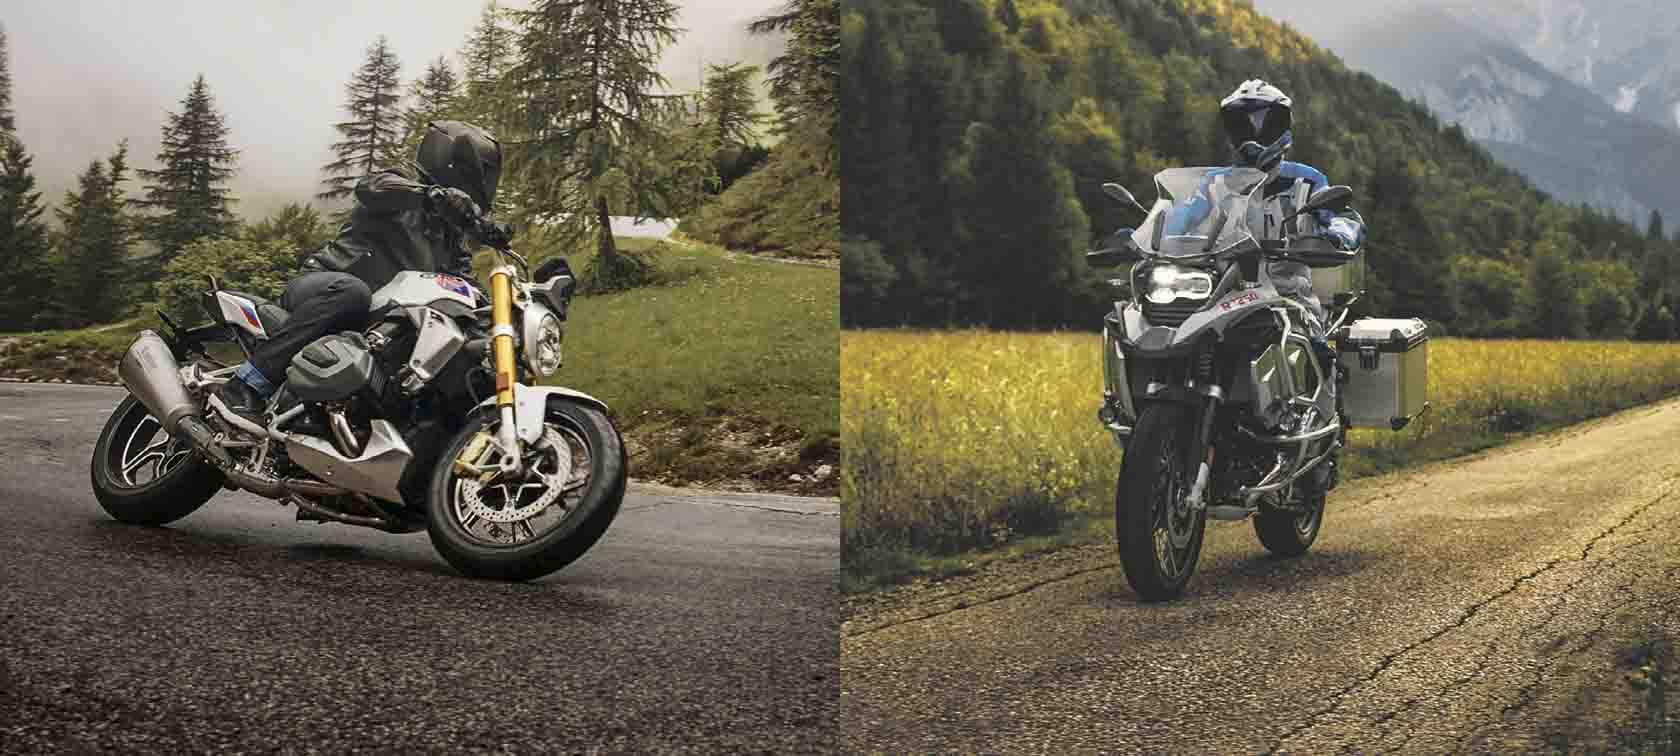 BMW Motorrad, Bike, Fahrerausstattung, Aktion, yamaha, ktm